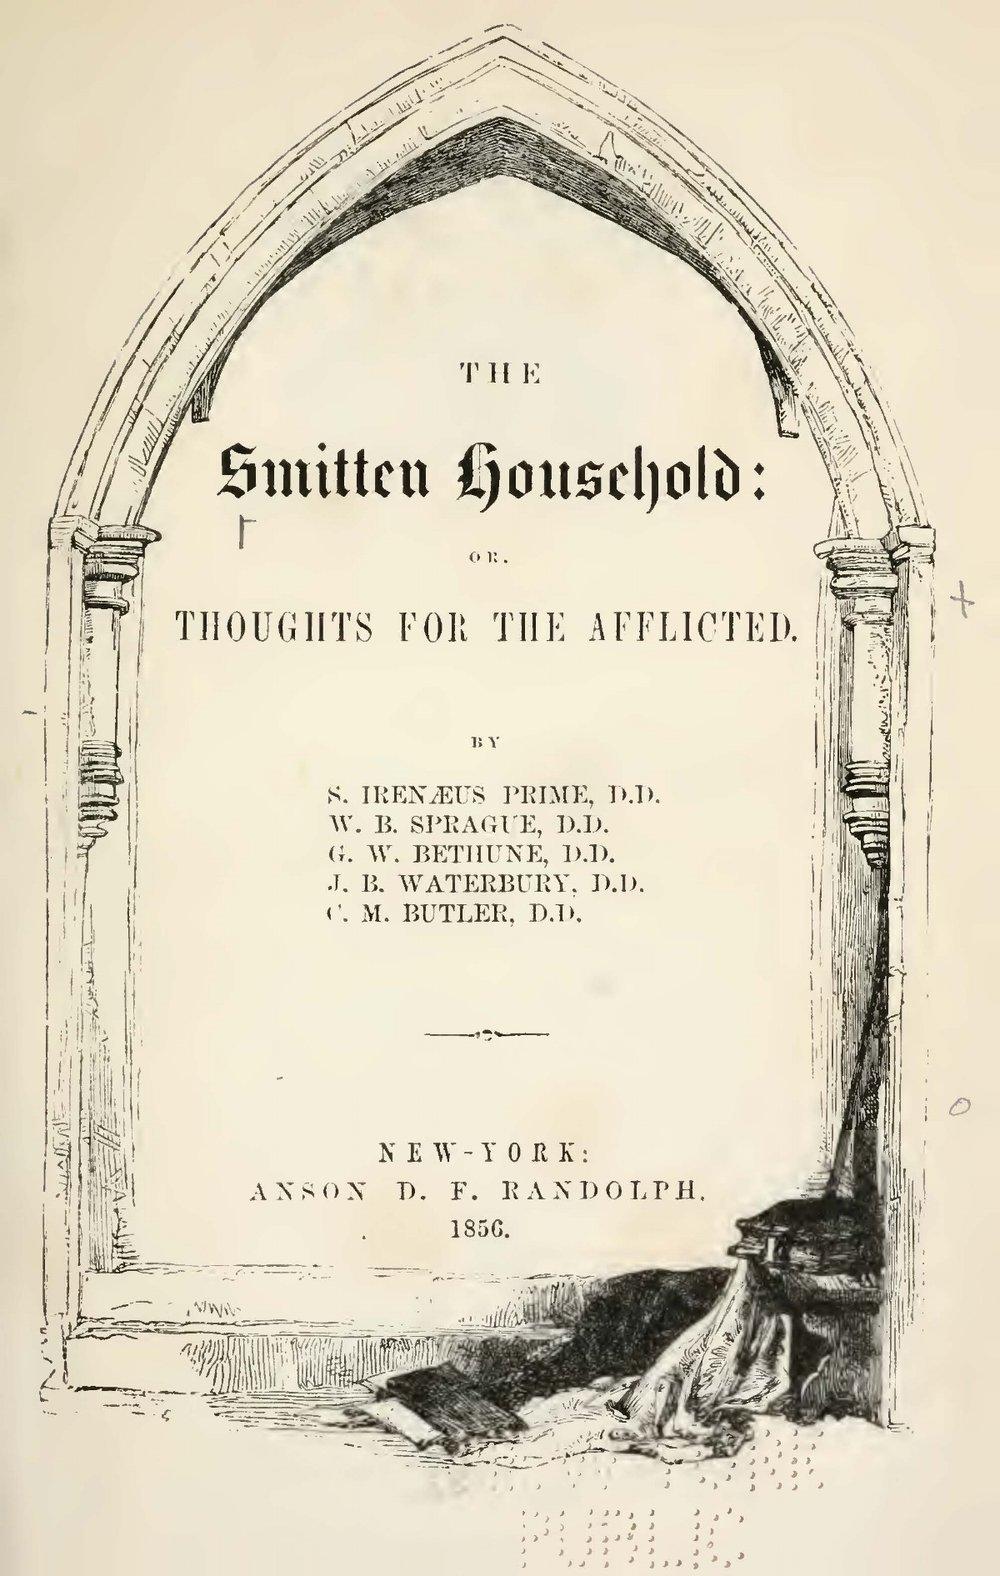 Prime, Samuel Irenaeus, The Smitten Household Title Page.jpg